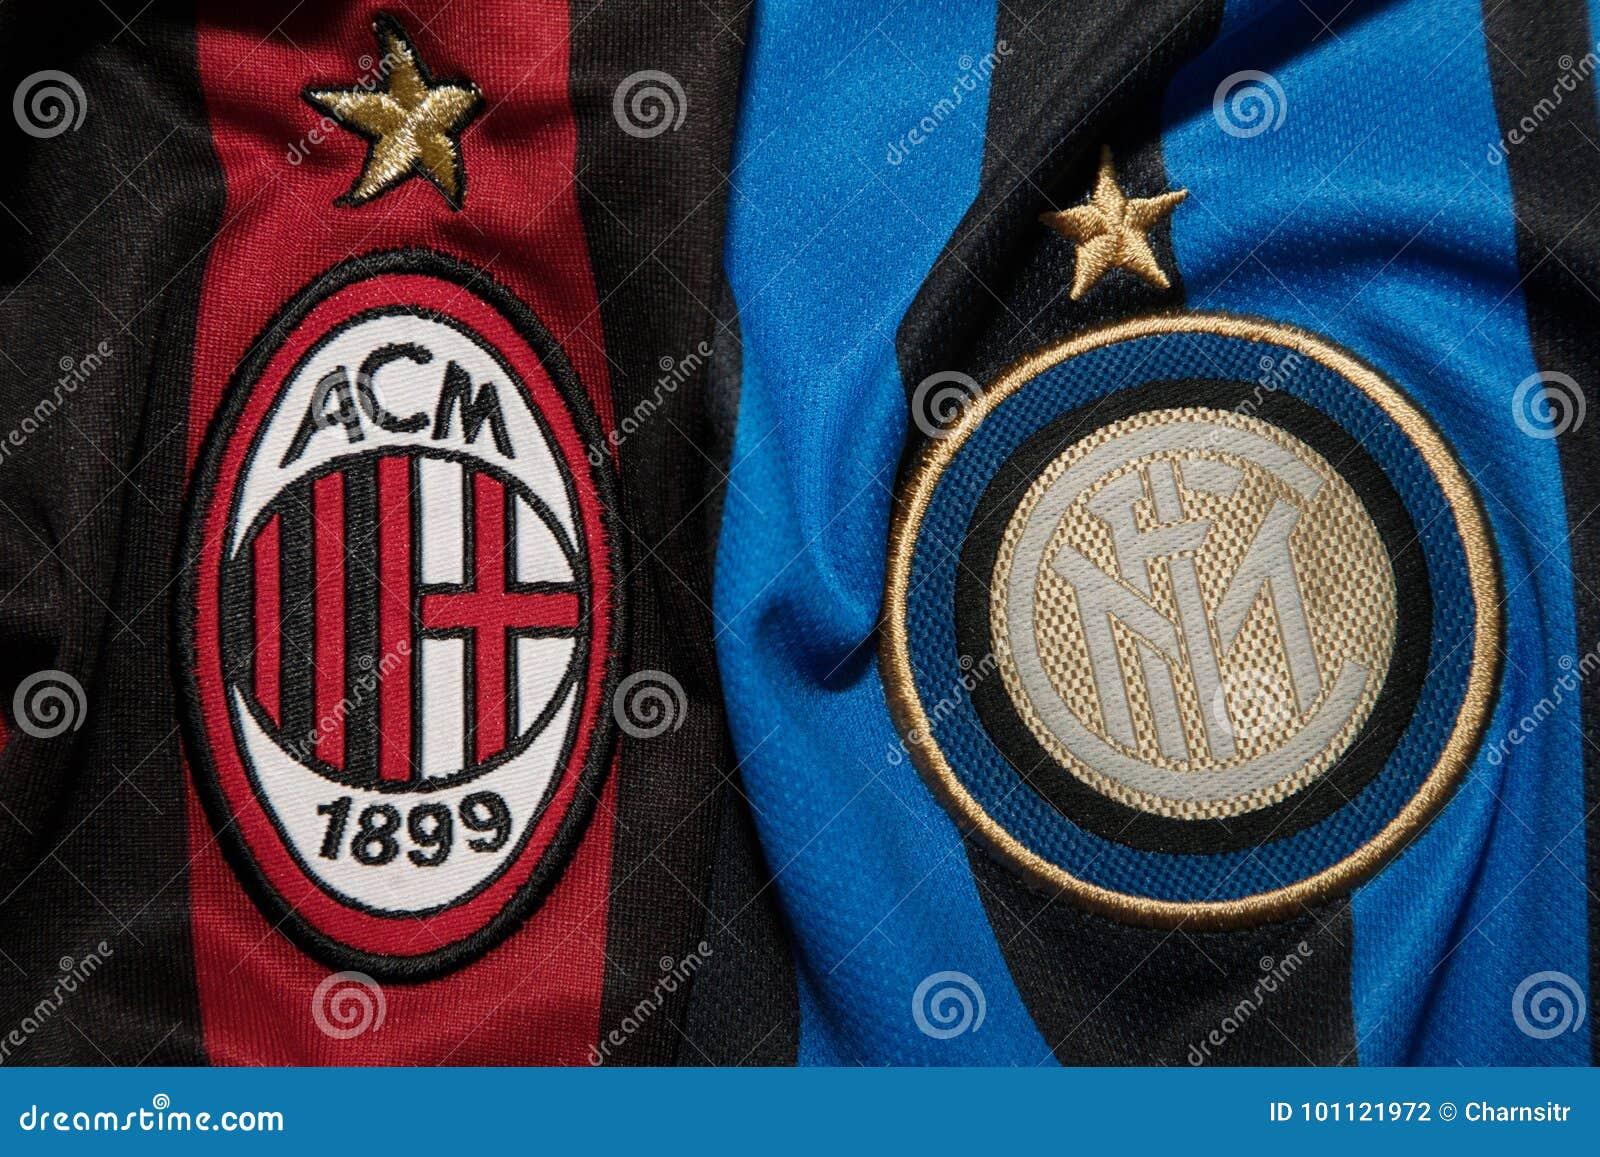 Bangkok Thailand August 5 Logo Of Ac Milan And Inter Milan Editorial Photography Image Of Background Inter 101121972